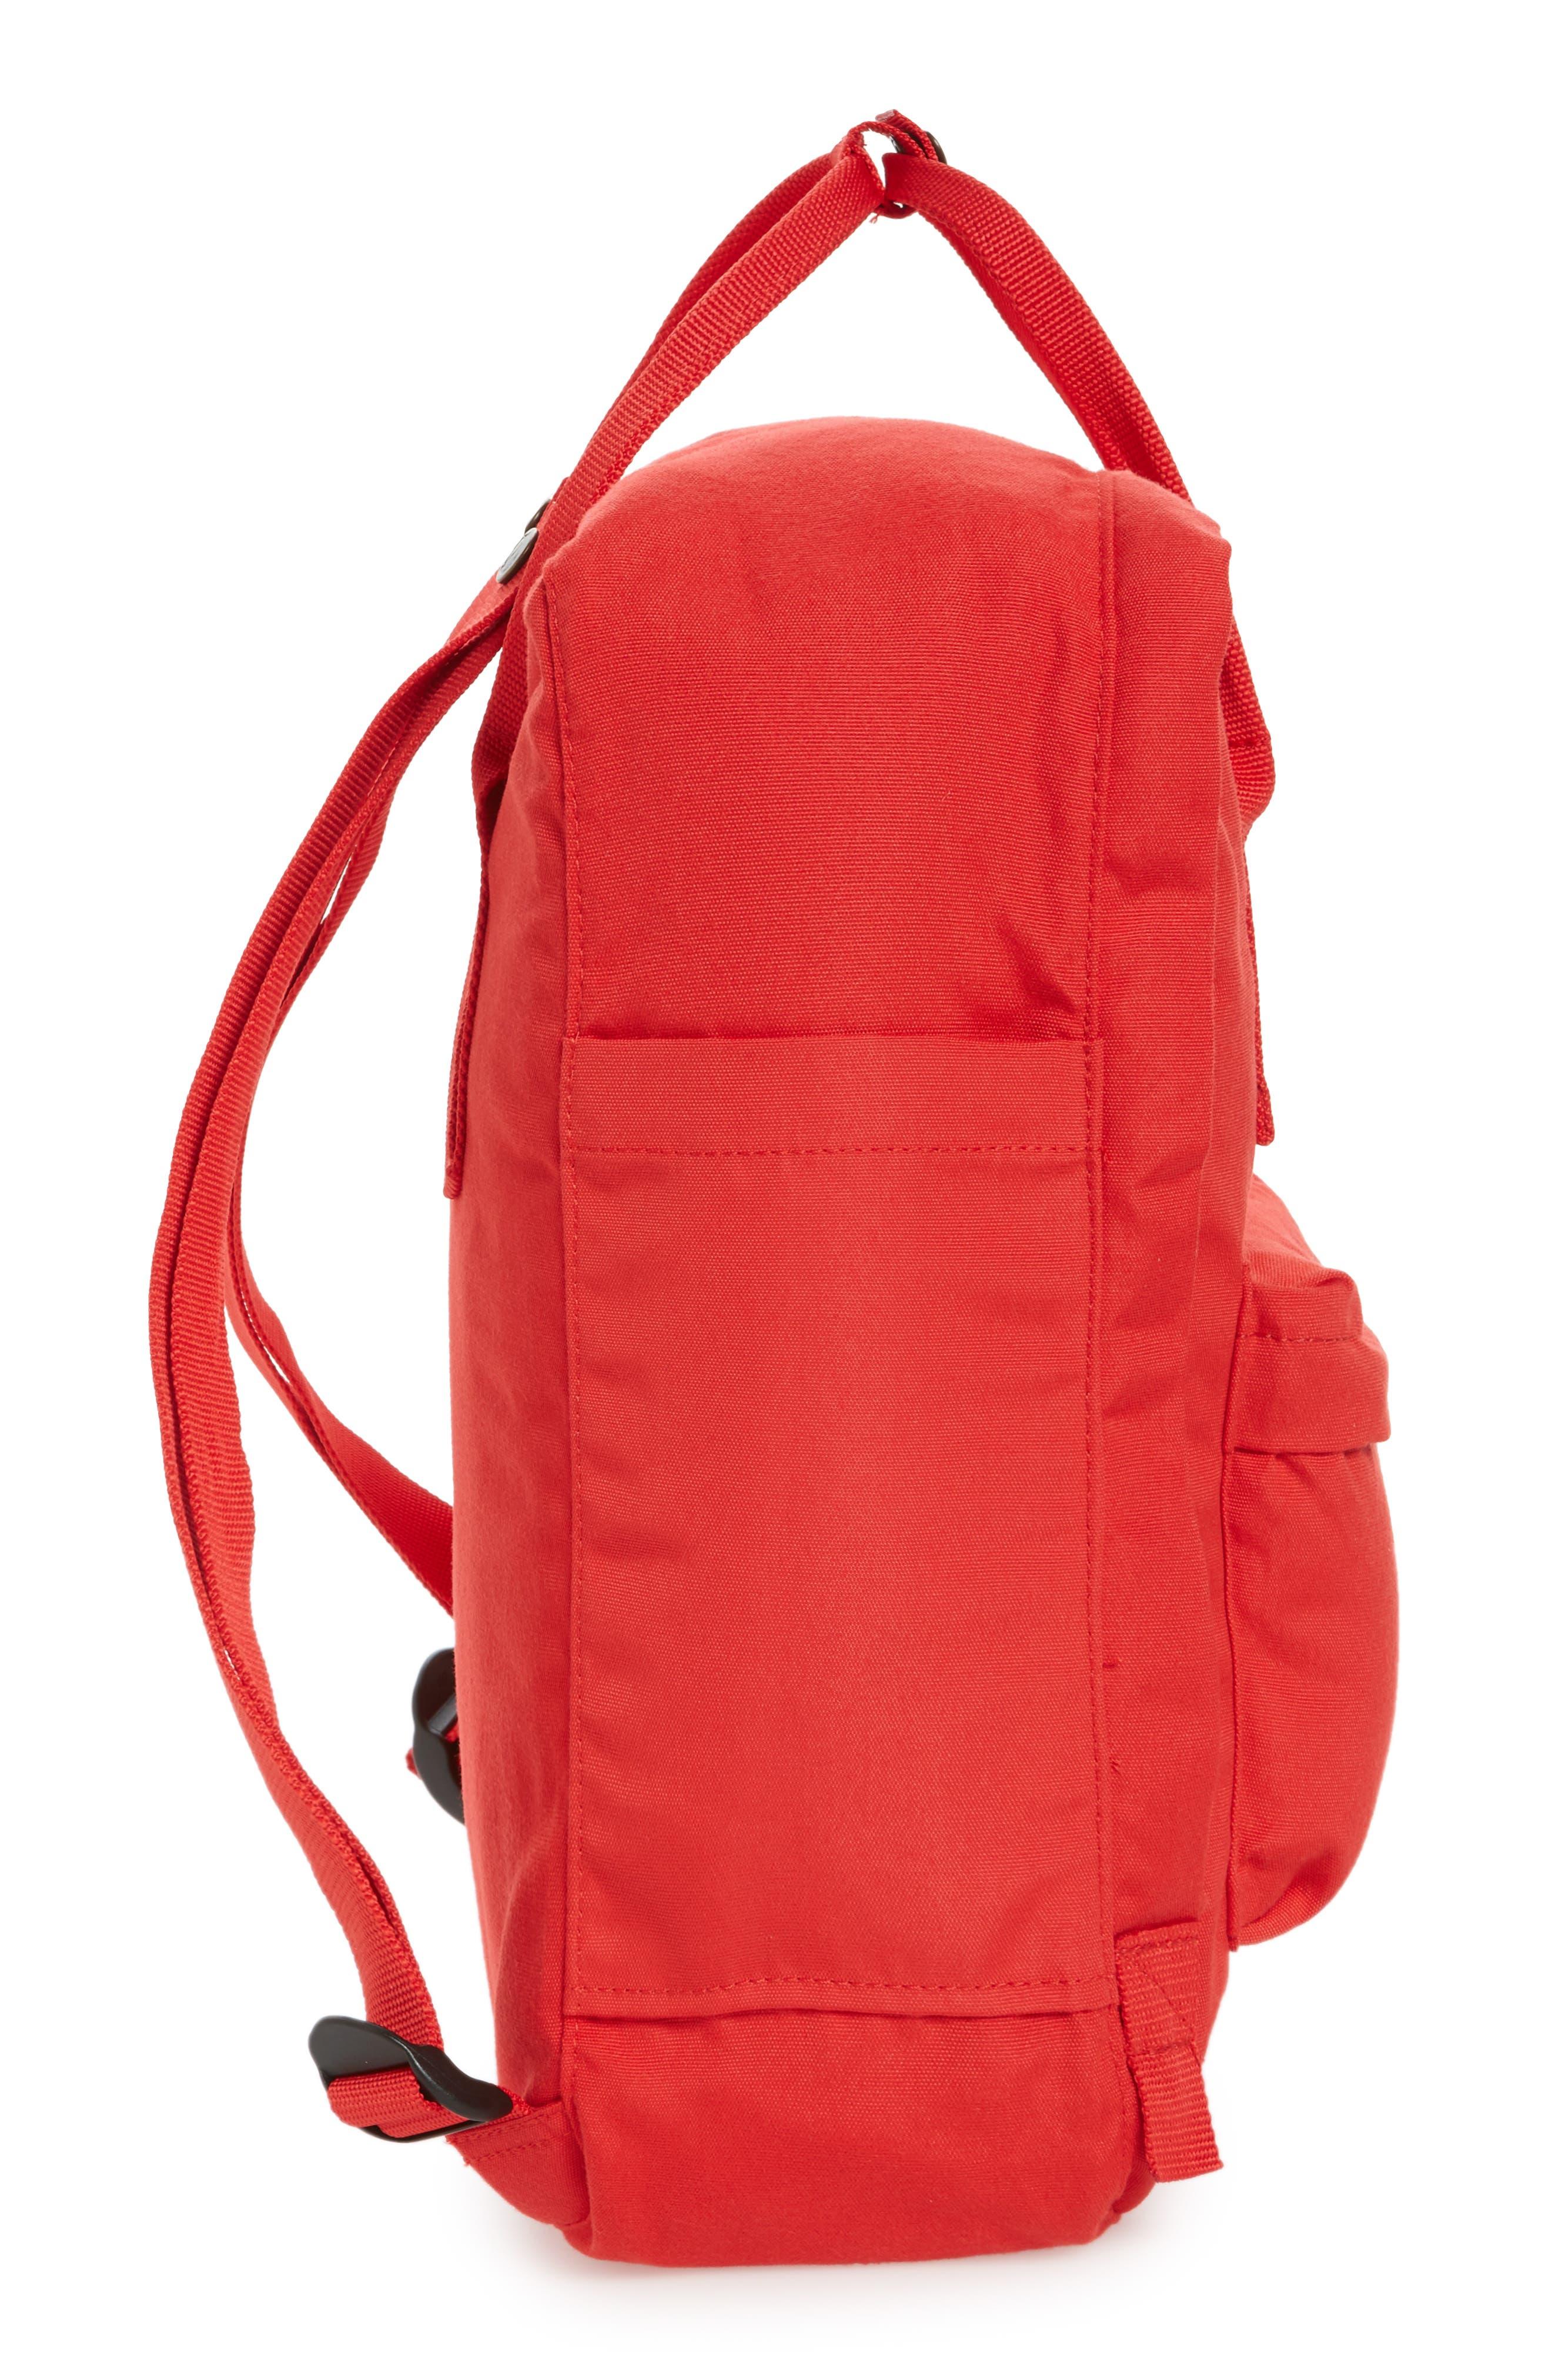 Re-Kånken Water Resistant Backpack,                             Alternate thumbnail 5, color,                             Red